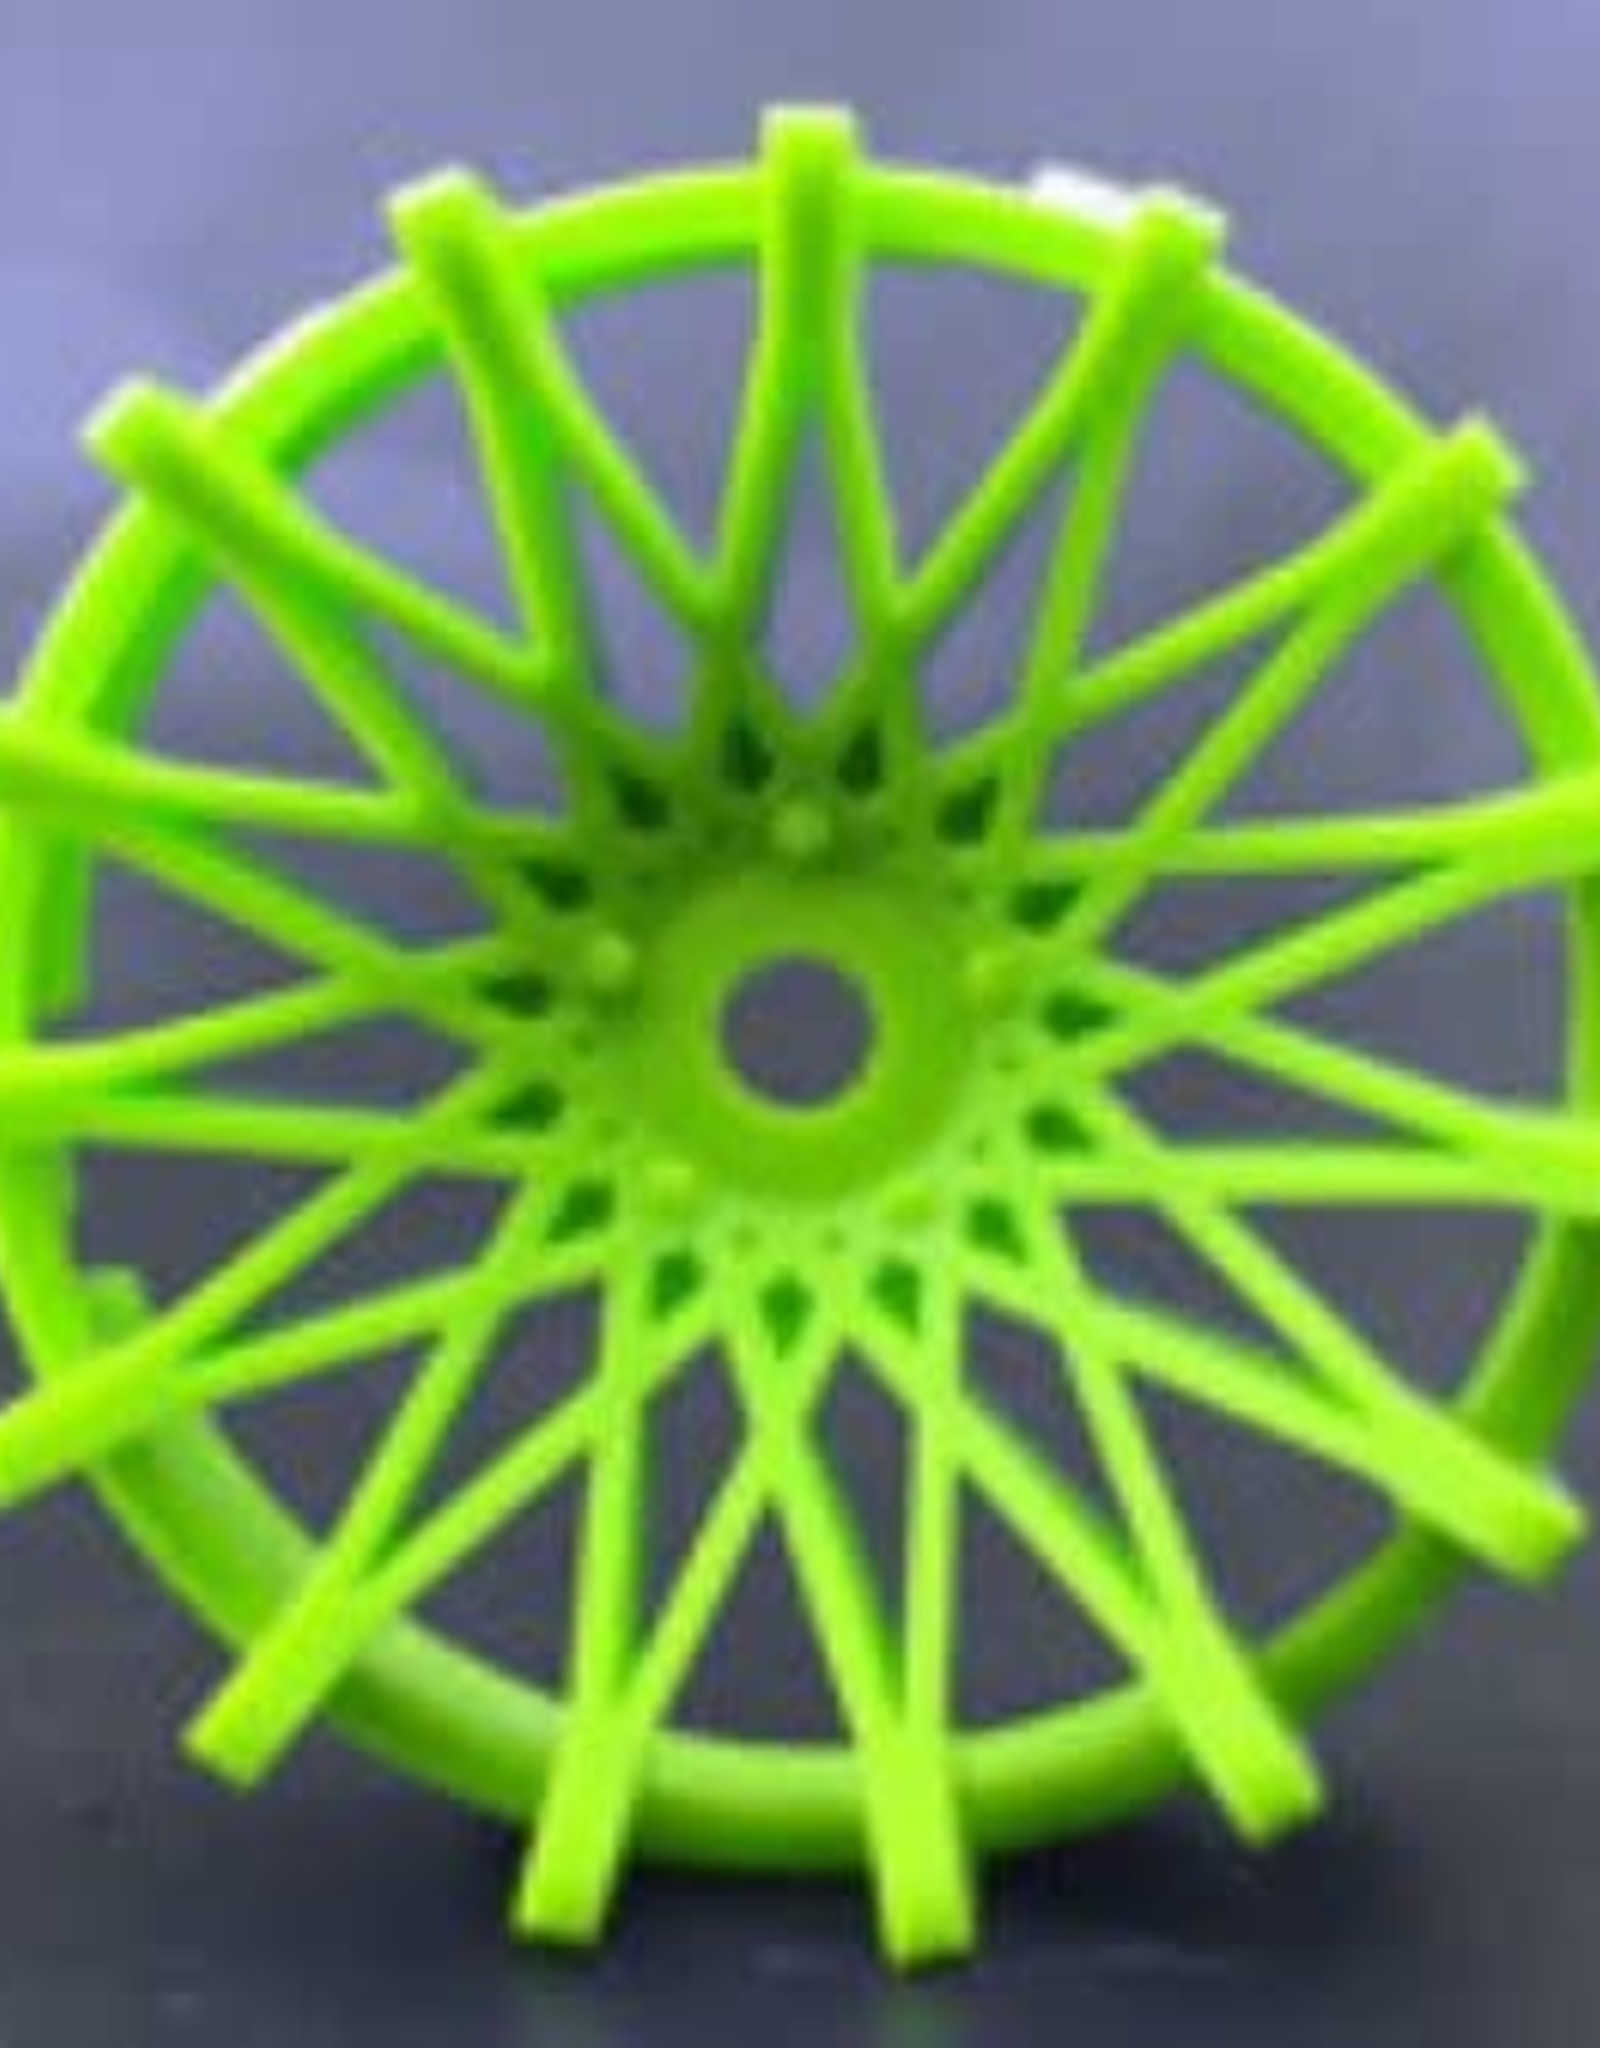 Tetsujin TT-7527 Super Rim Dahlia Fine Green Disks 2pcs. by Tetsujin